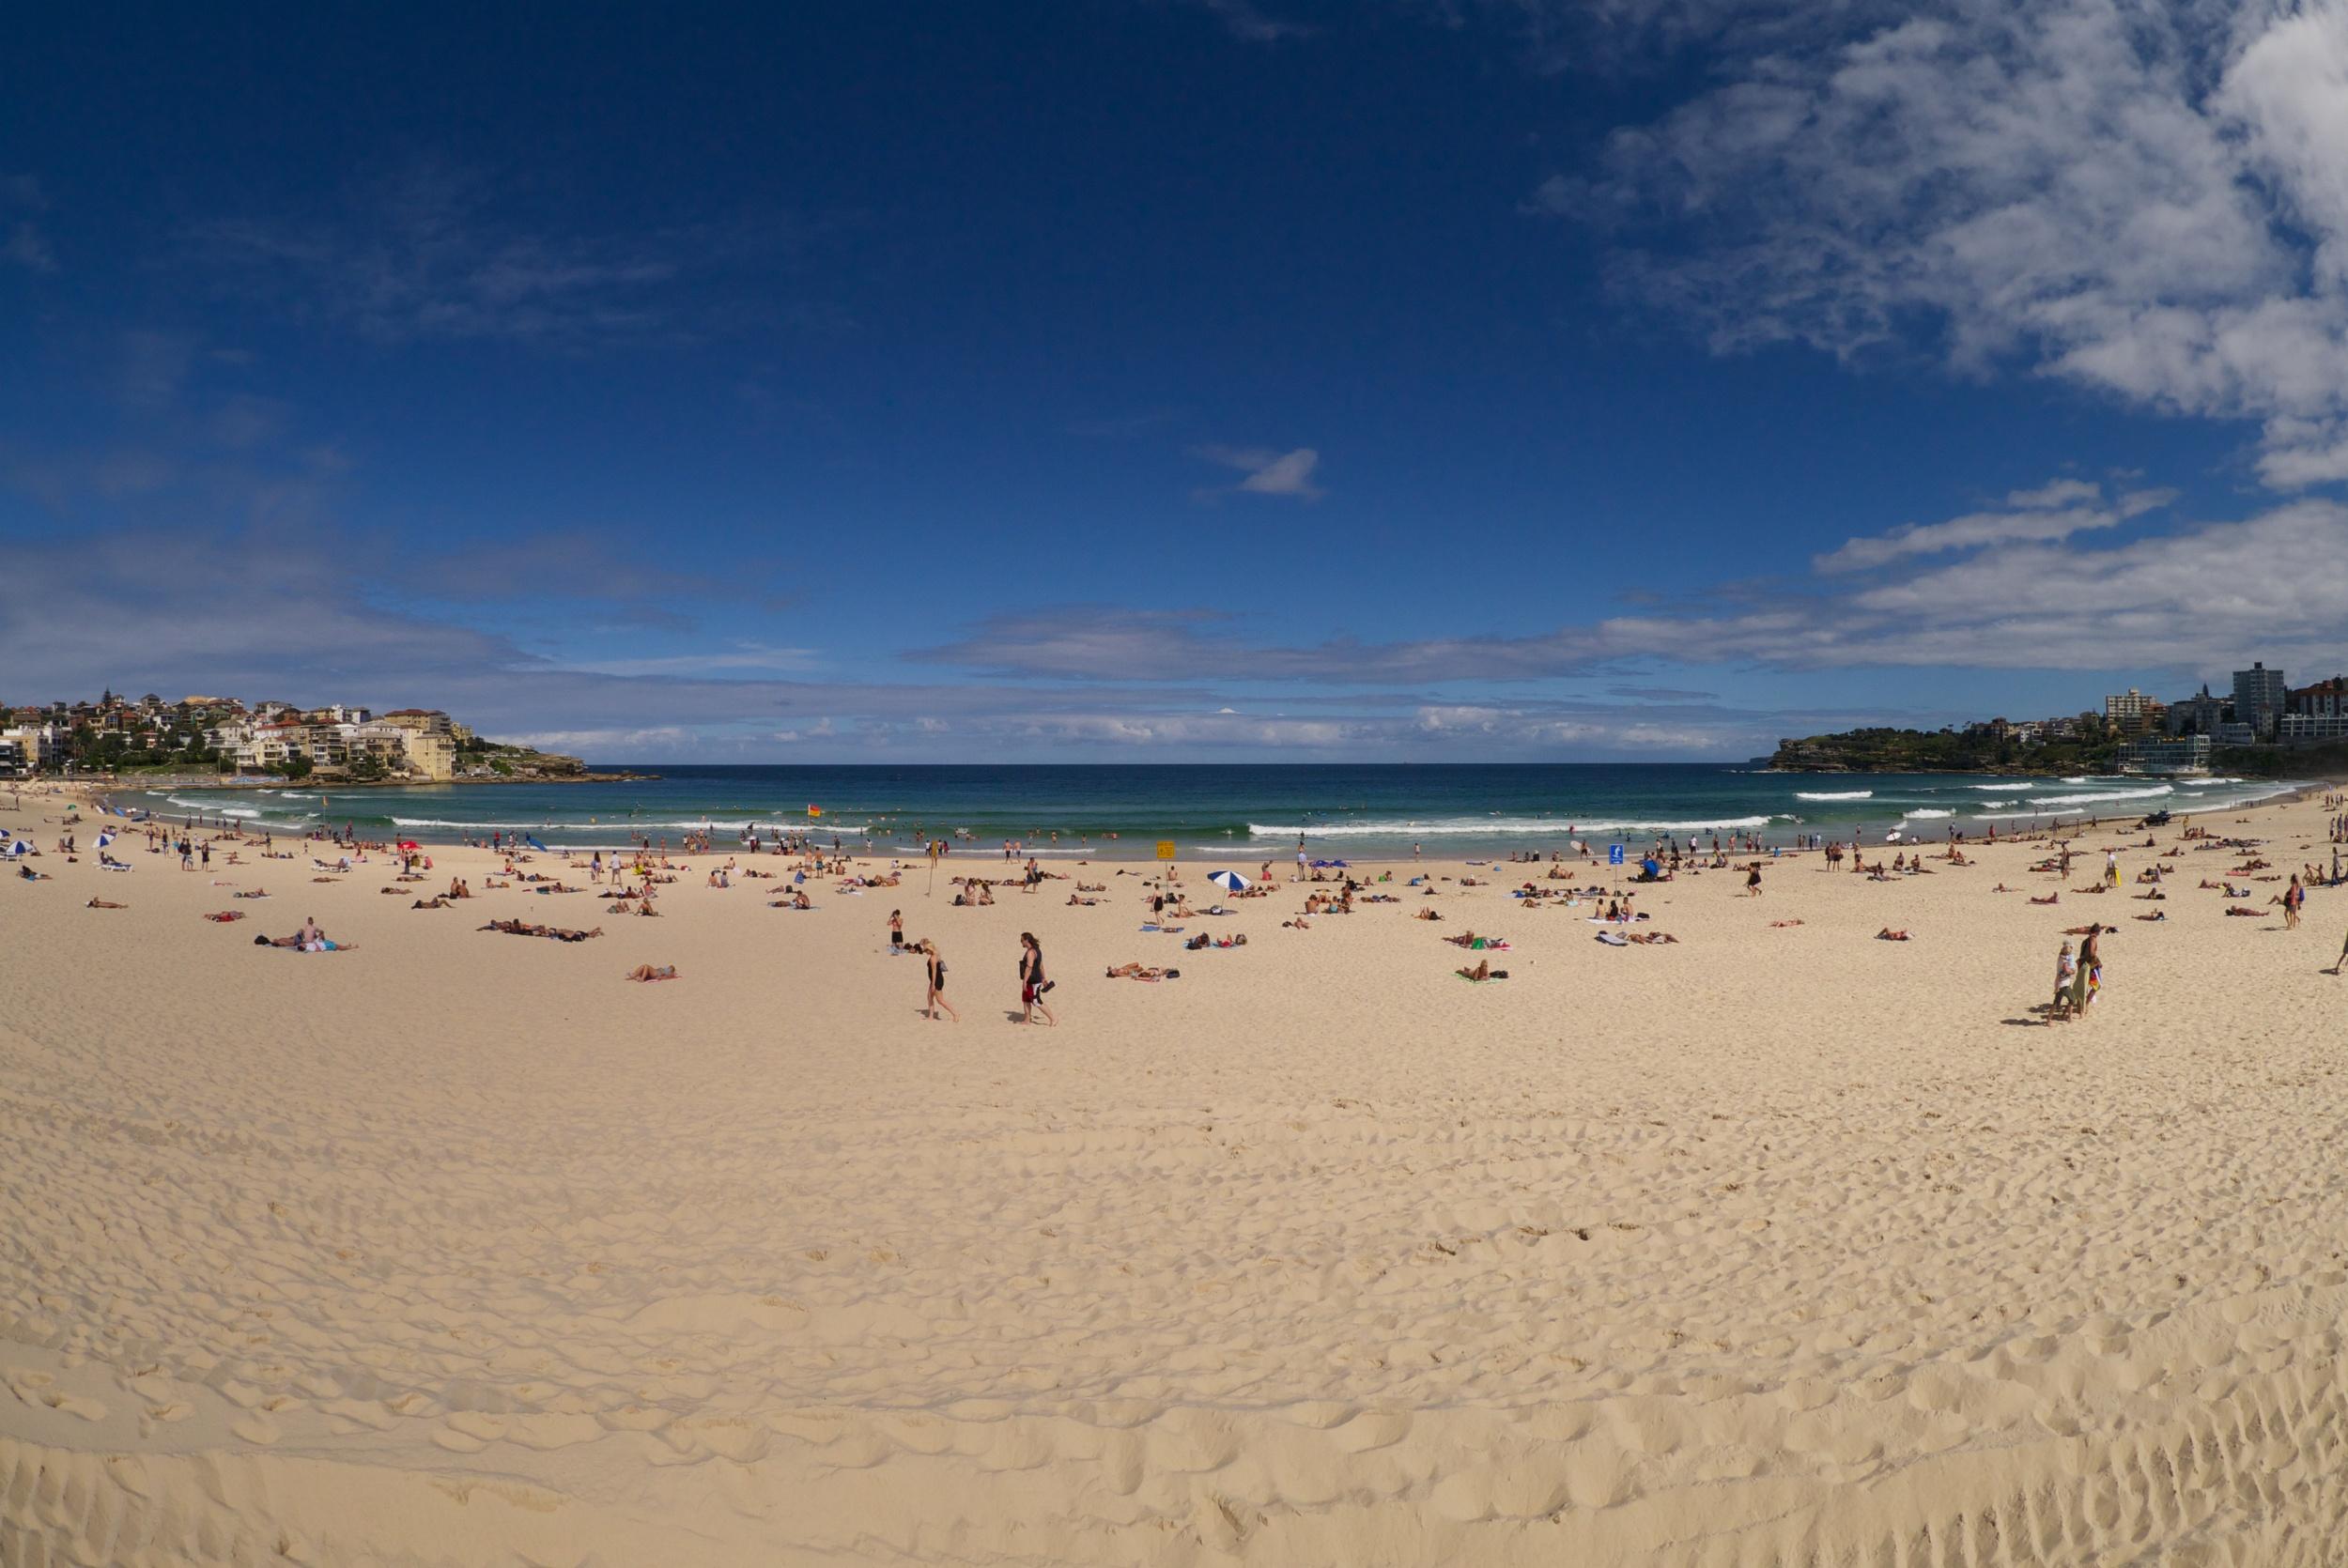 Bondi beach, the preferred destination for post-training relaxation!